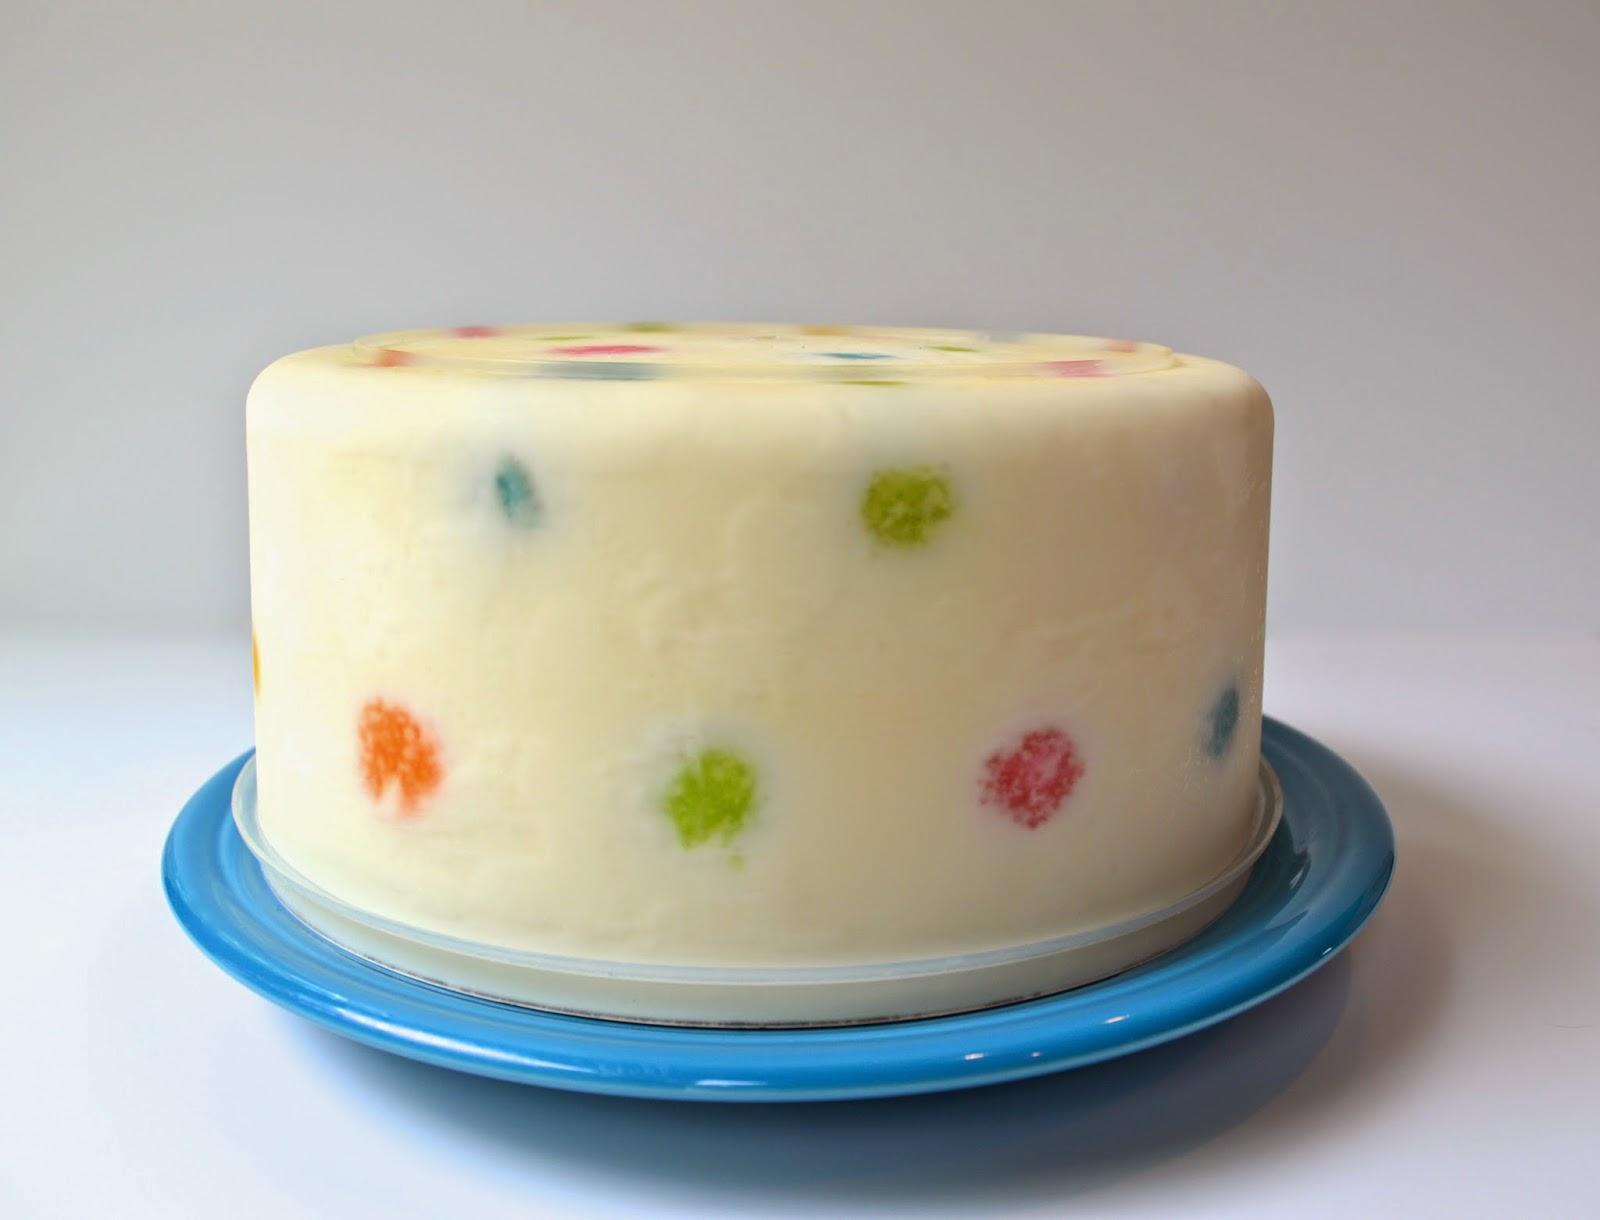 polka-dot-suprise-inside-cake-ice-cream-free-tutorial-KUTV2_deborah-stauch